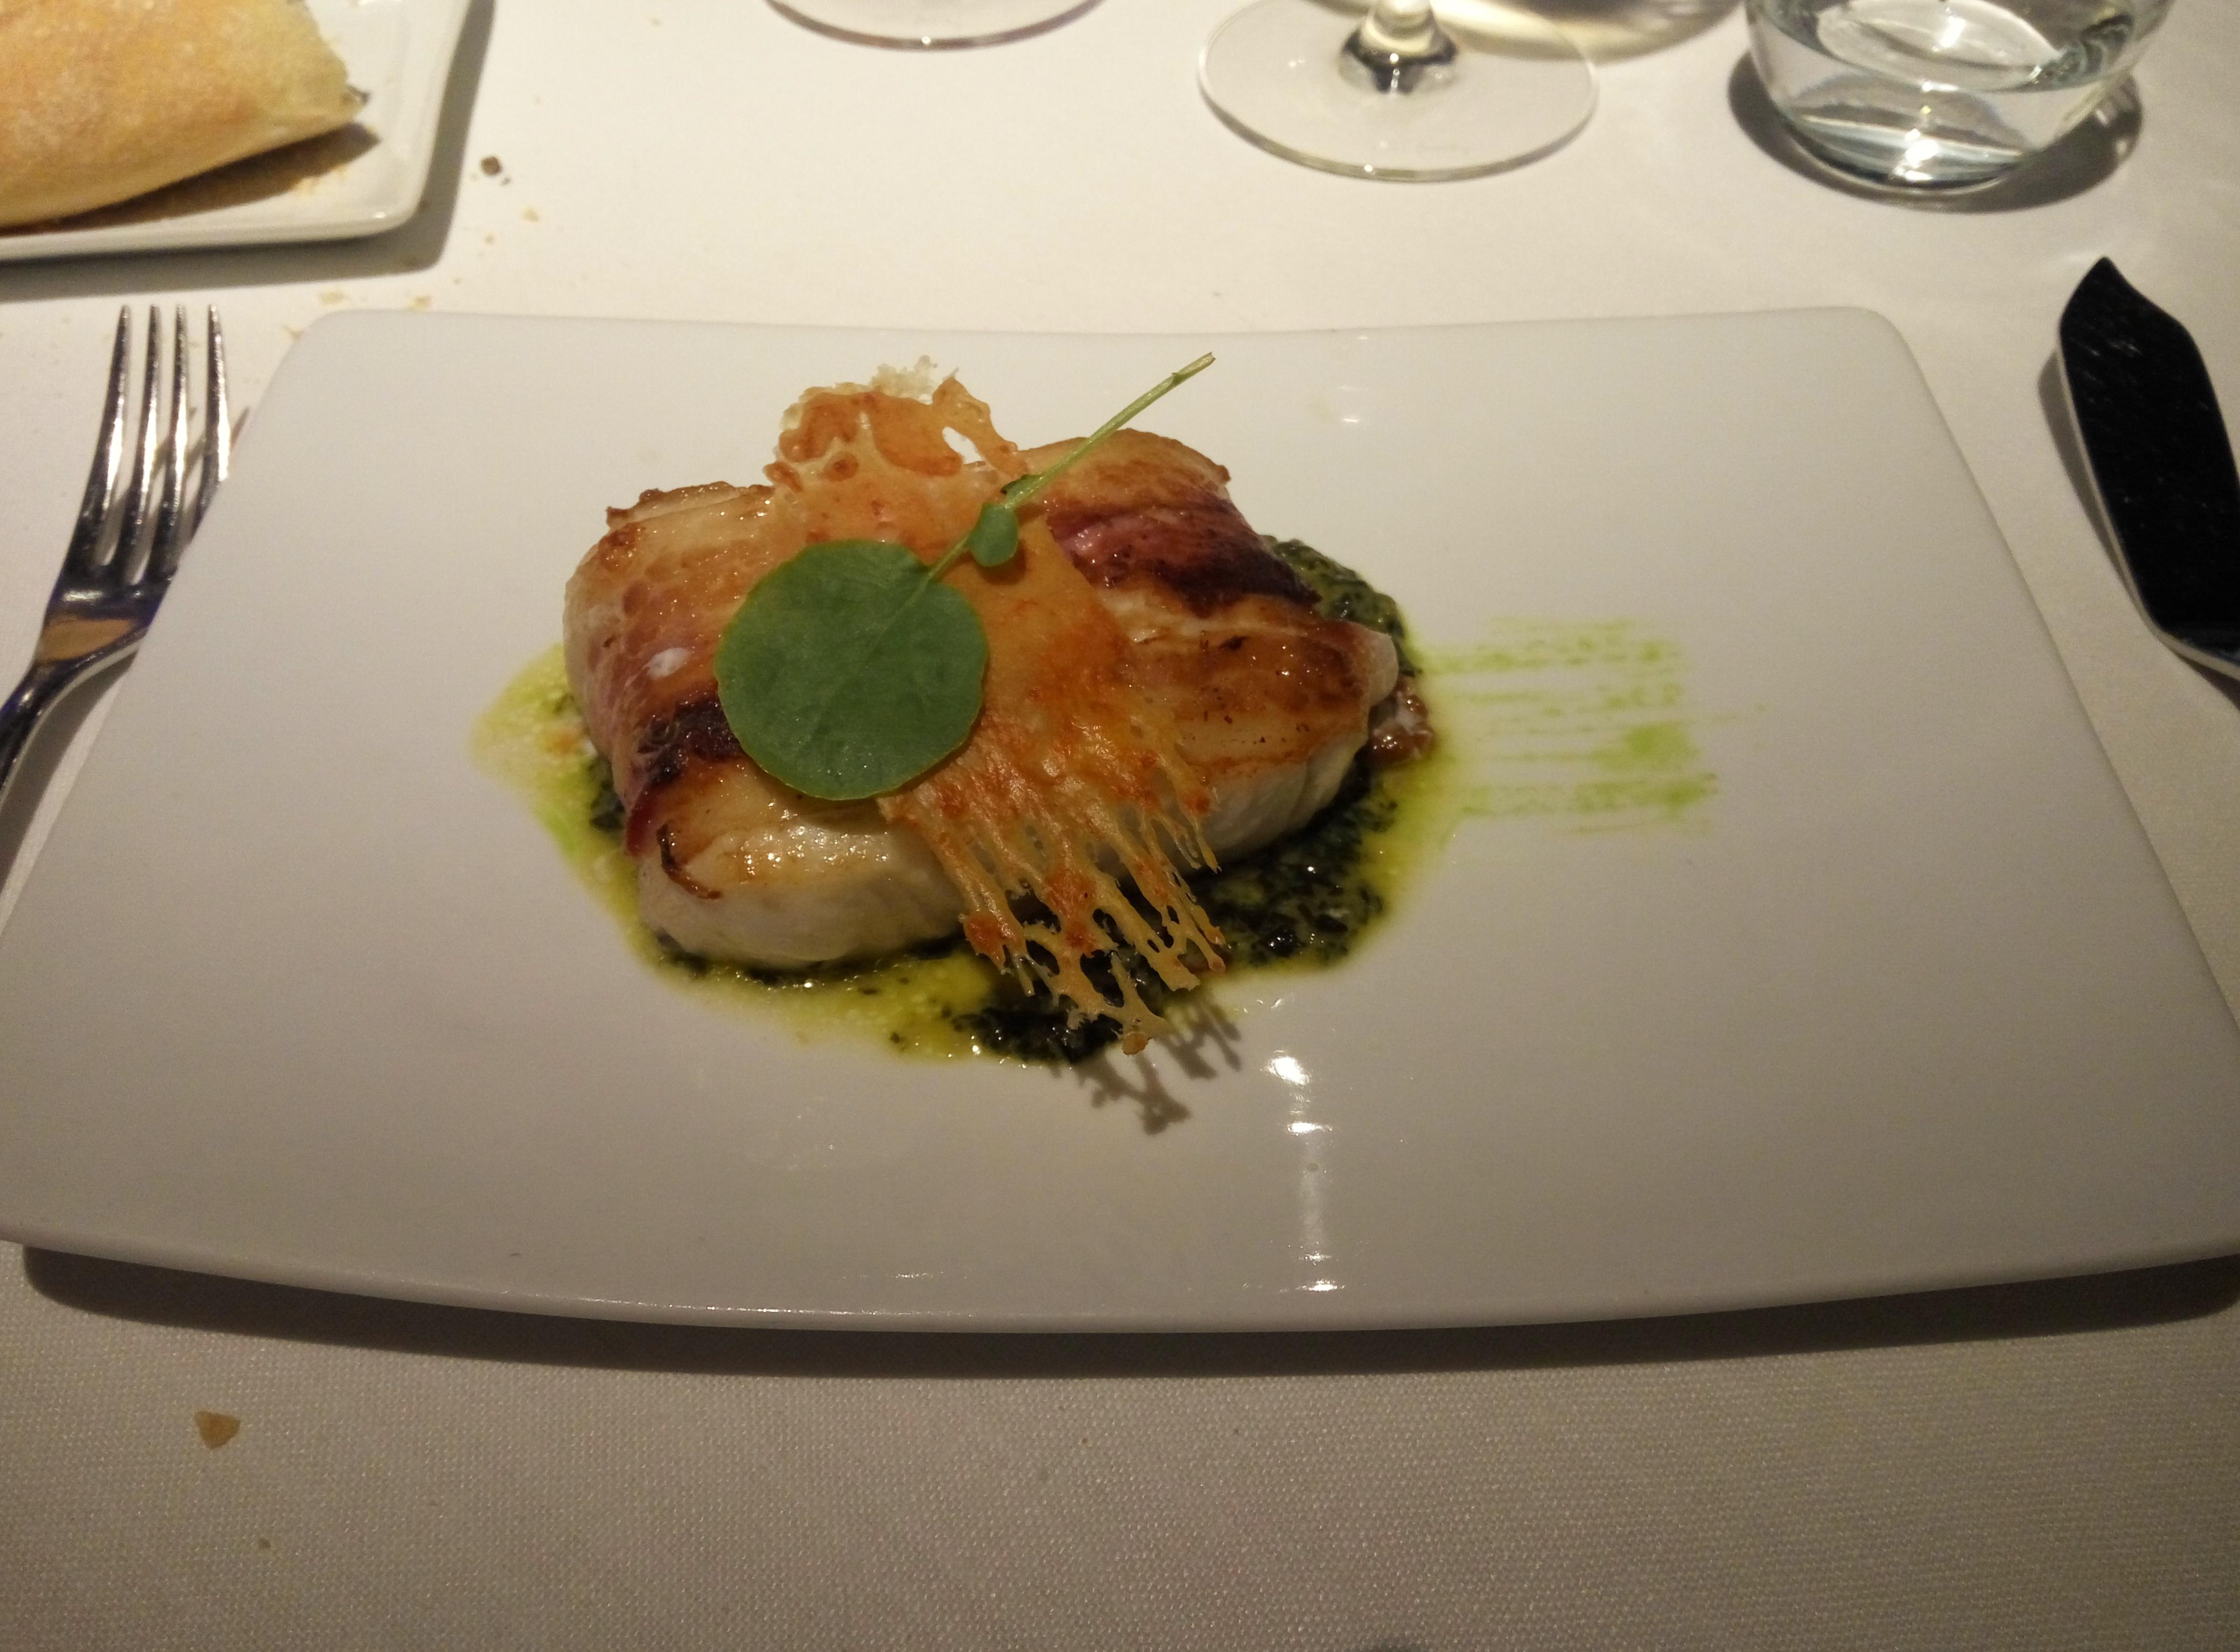 Restaurante en Hondarribia Merluza con panceta y espinacas trufadas